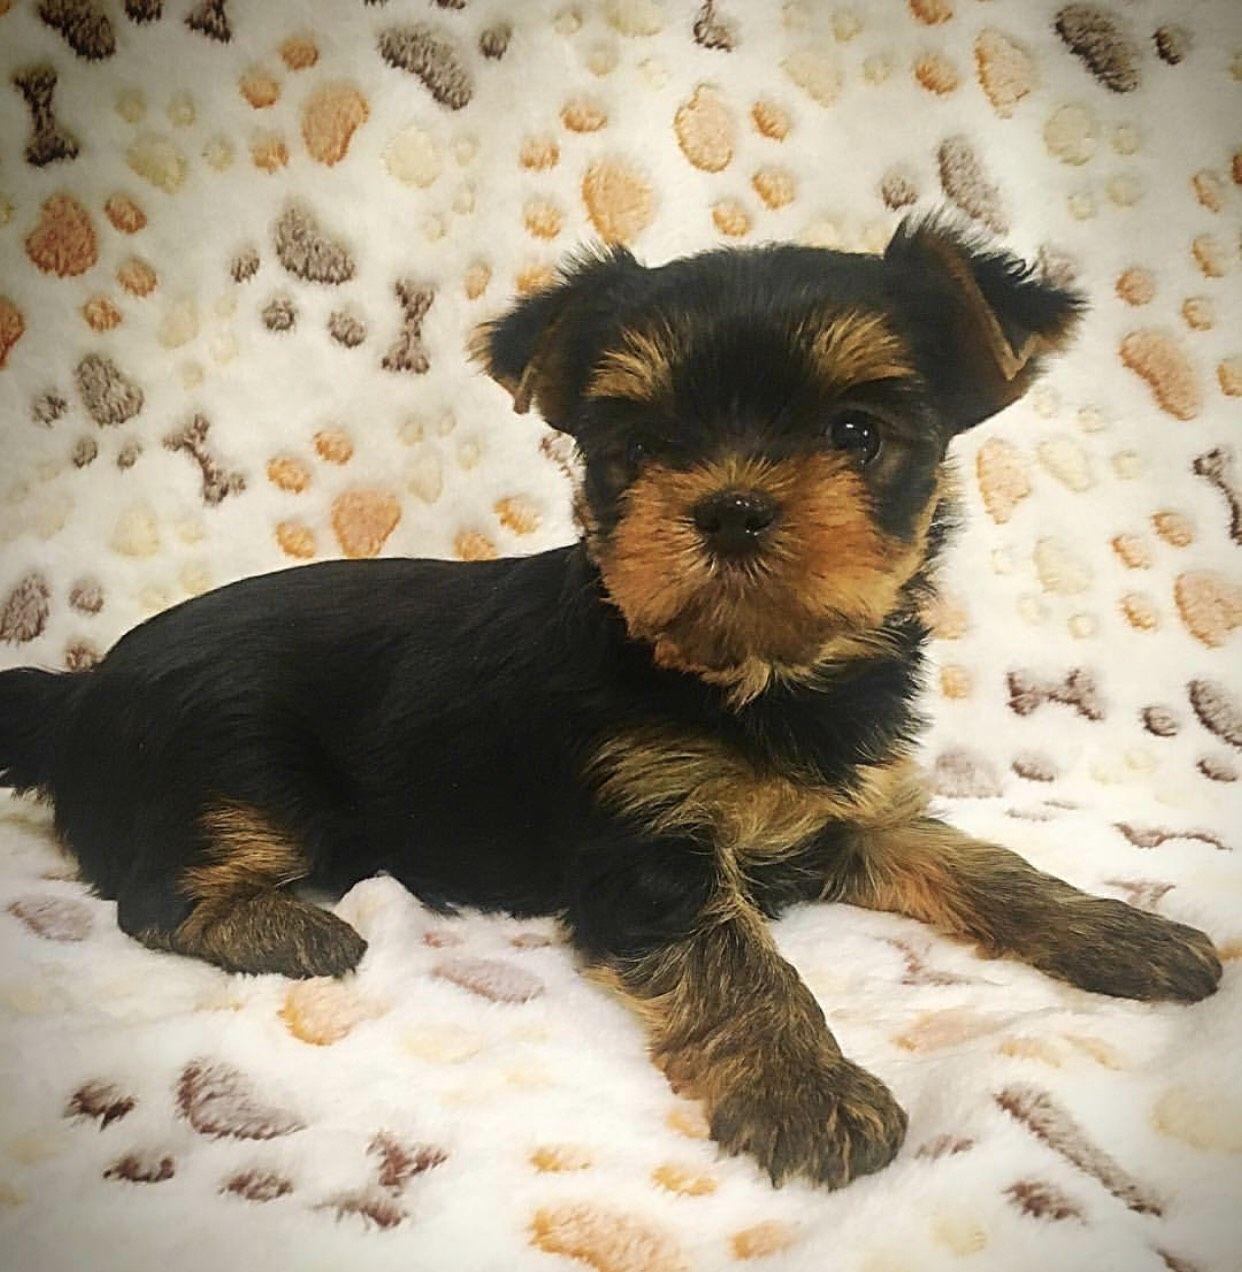 Pin By Gail Schmidt On Yorkie Yorkshire Terrier Puppies Yorkie Yorkie Puppy